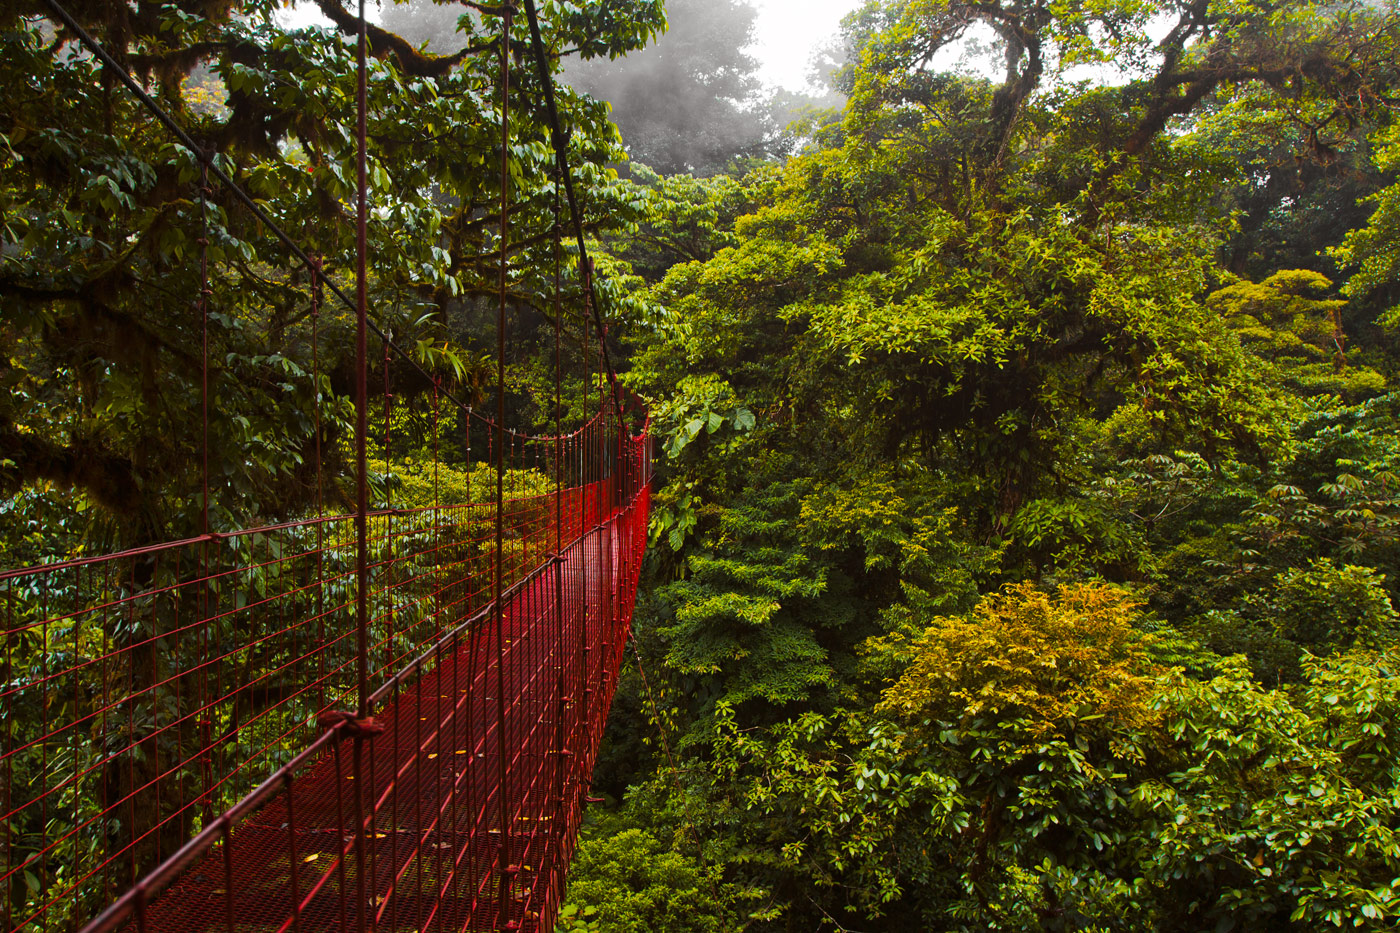 Nick-Zantop-Photography-Rainforest-2